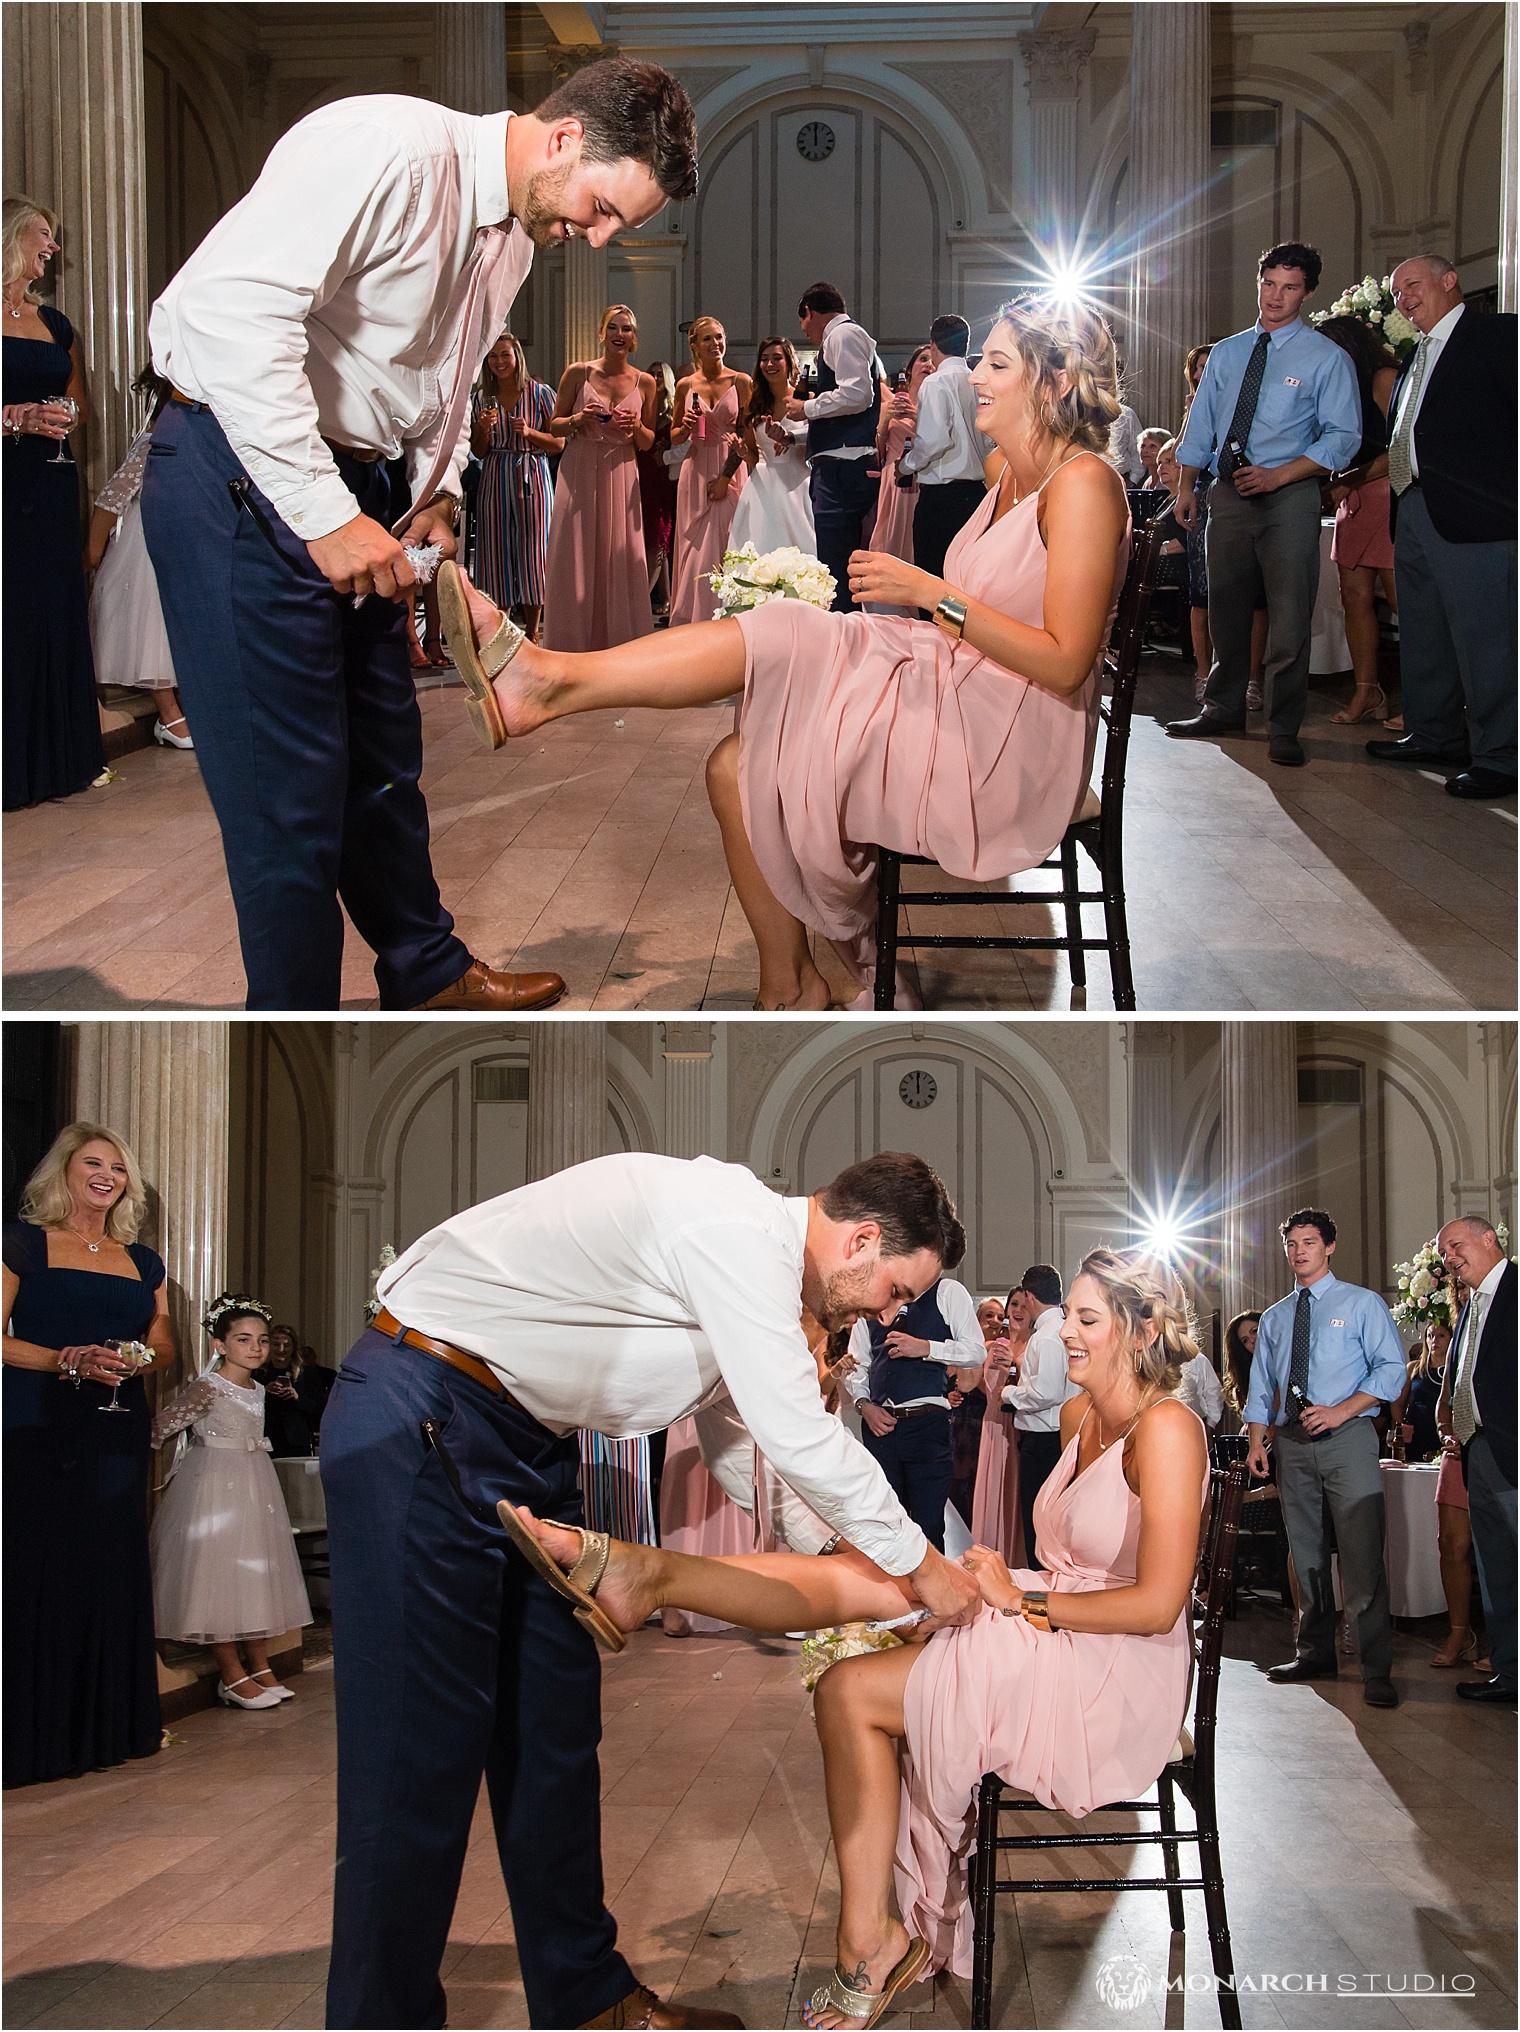 st-augustine-wedding-photographer-144.jpg